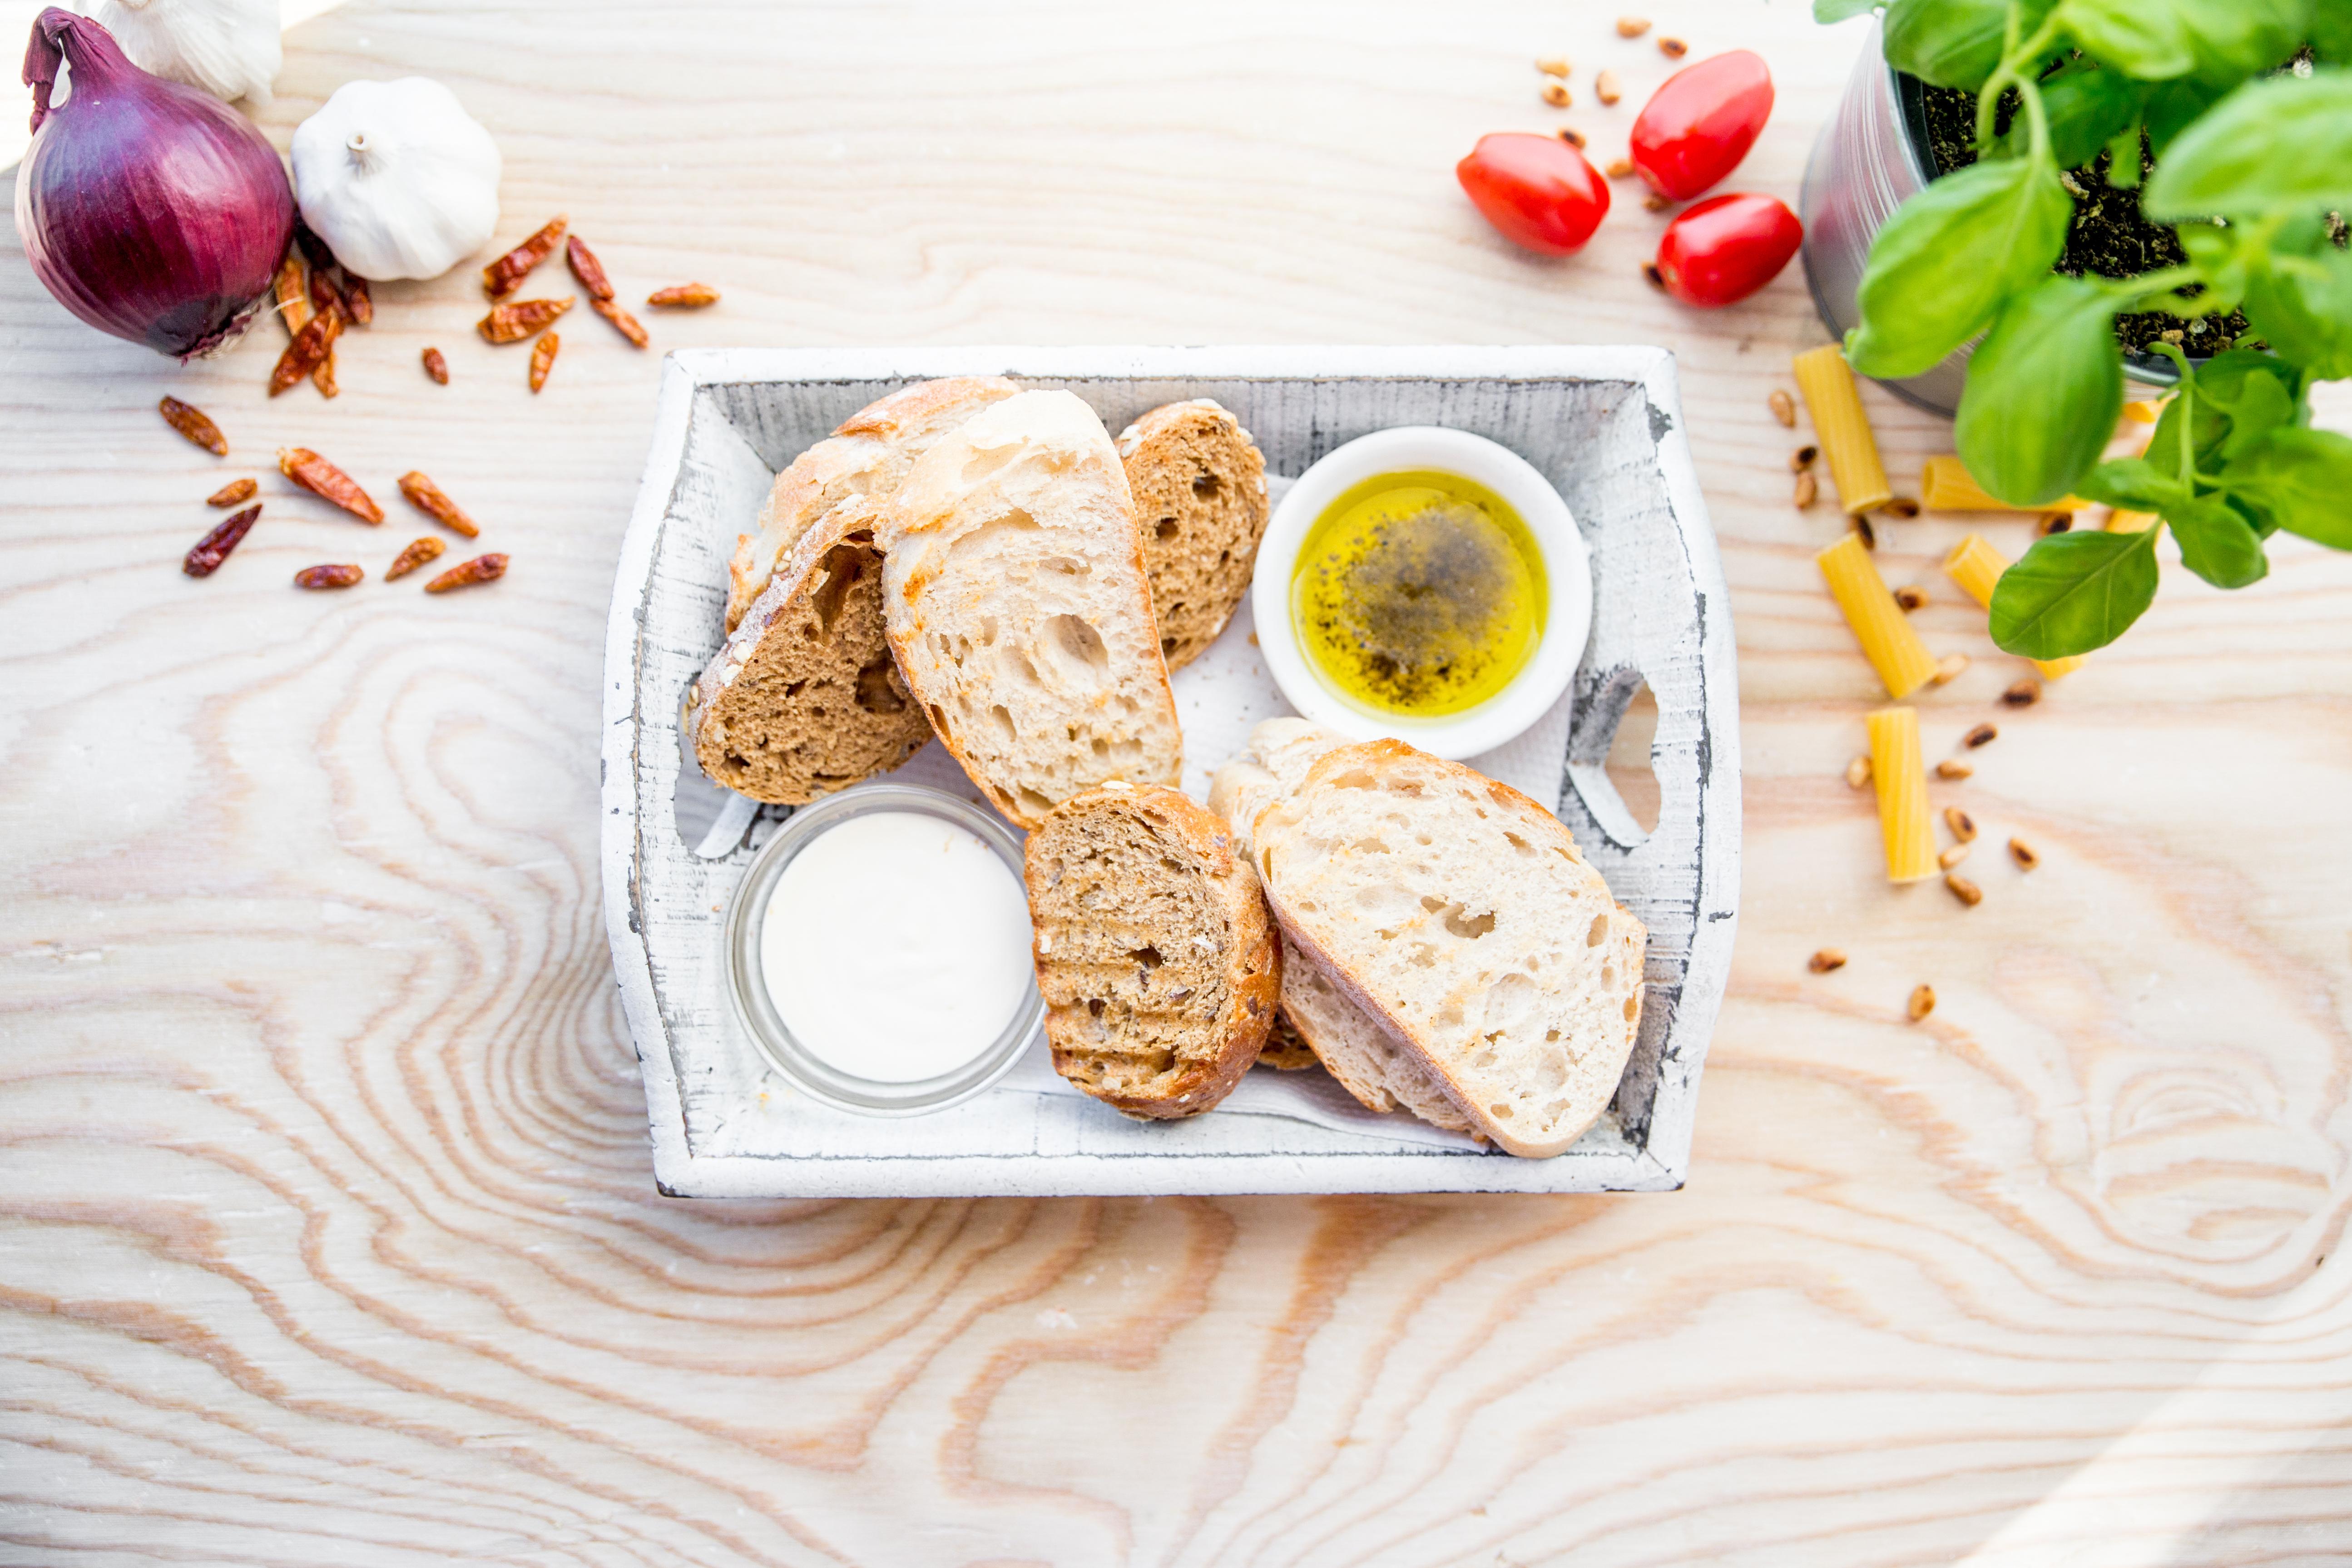 Pane e olio/aioli